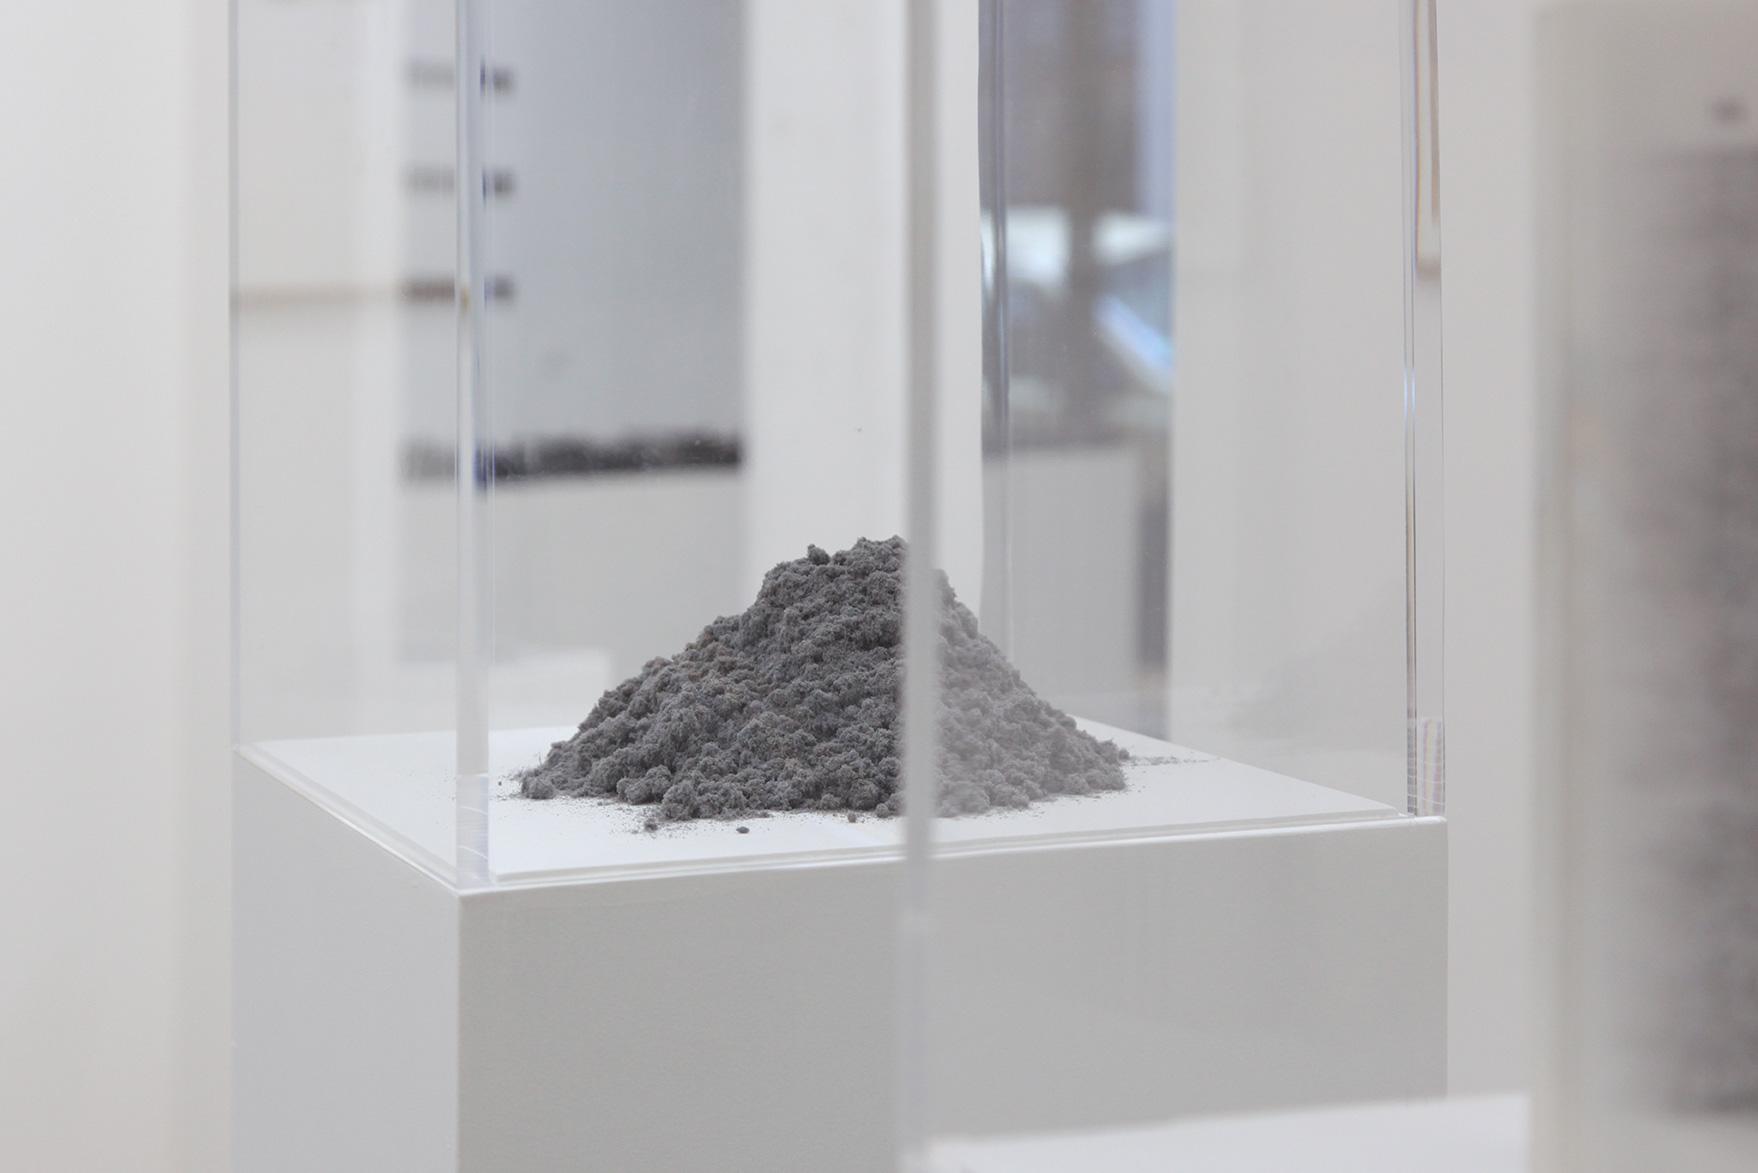 26.01.2018 until 05.05.2018 , Catherine Bastide projects, Marseille, exhibition view, 2018 - Jérémie Bennequin, TOM(B)E & MO(N)T,  detail view